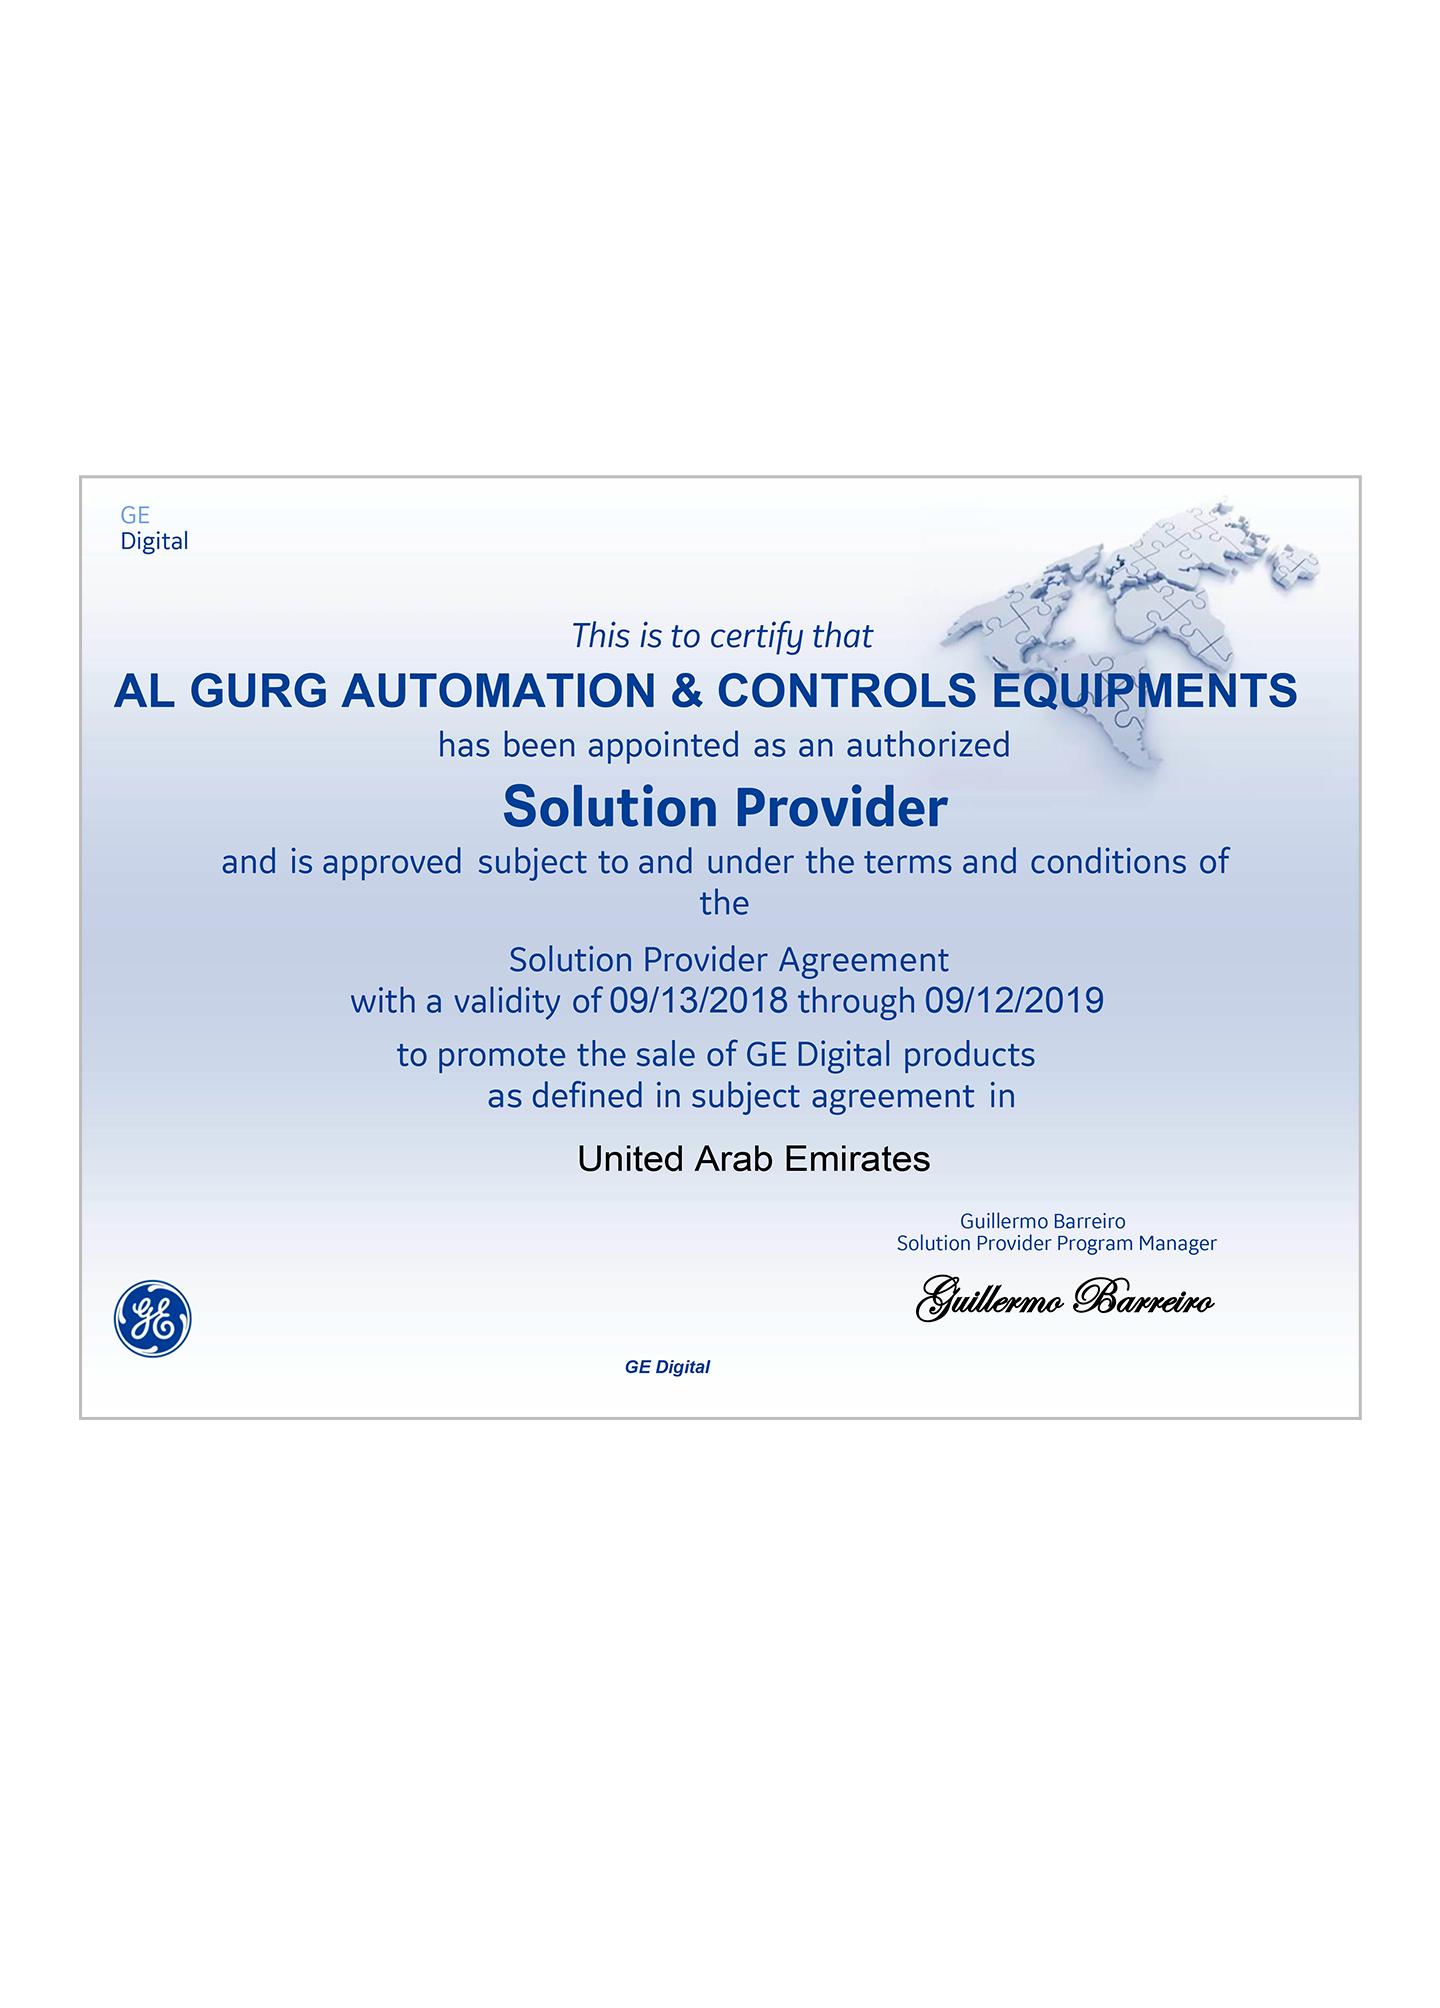 Solution-Provider-Certificate-2019--AL-GURG-AUTOMATION--CONTROLS-EQUIPM.jpg